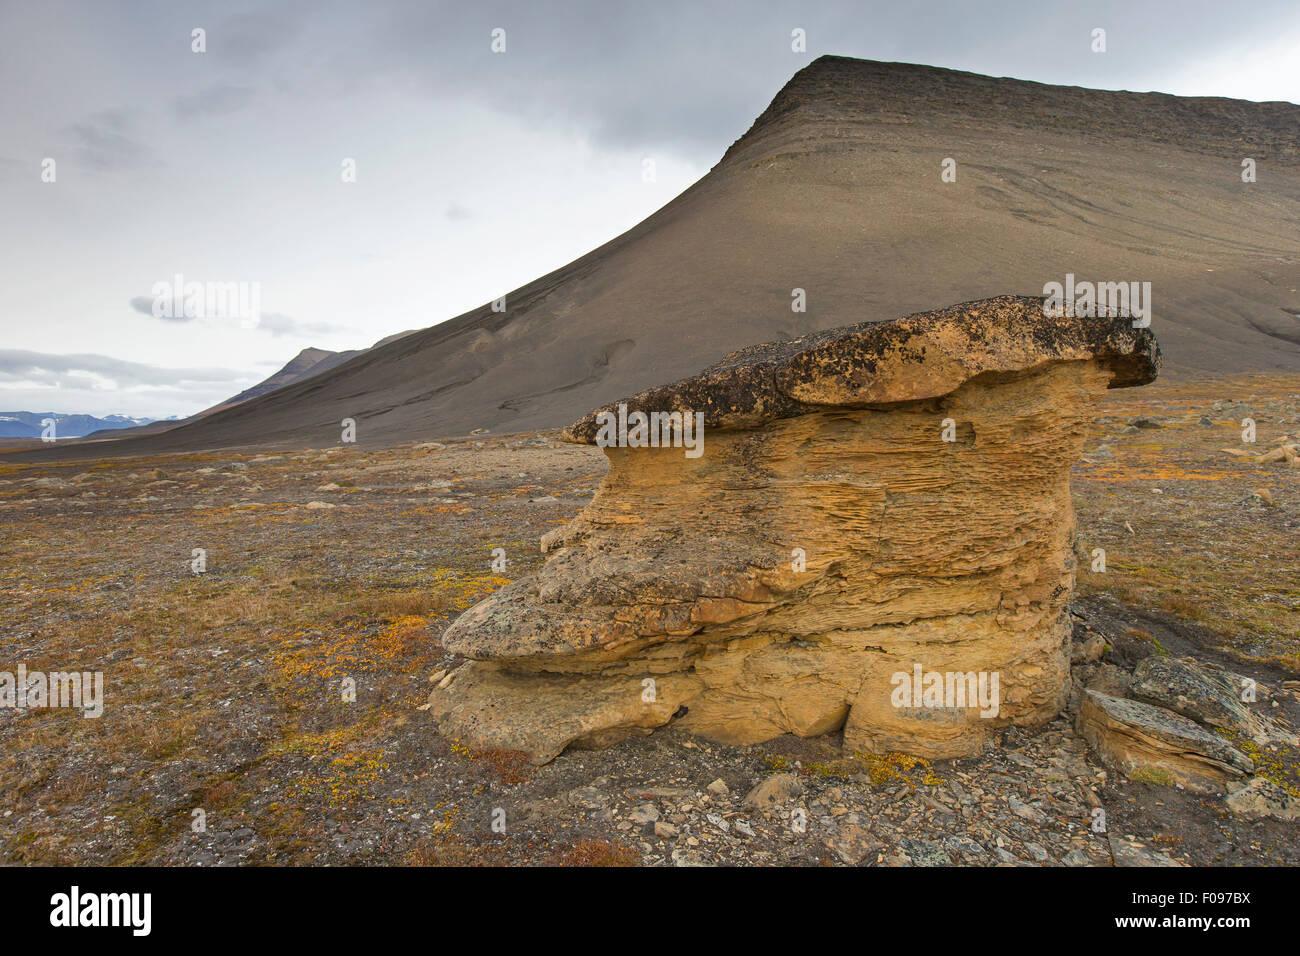 Festningen sandstone rock on the beach of Boltodden, Kvalvagen, Svalbard / Spitsbergen, Norway - Stock Image